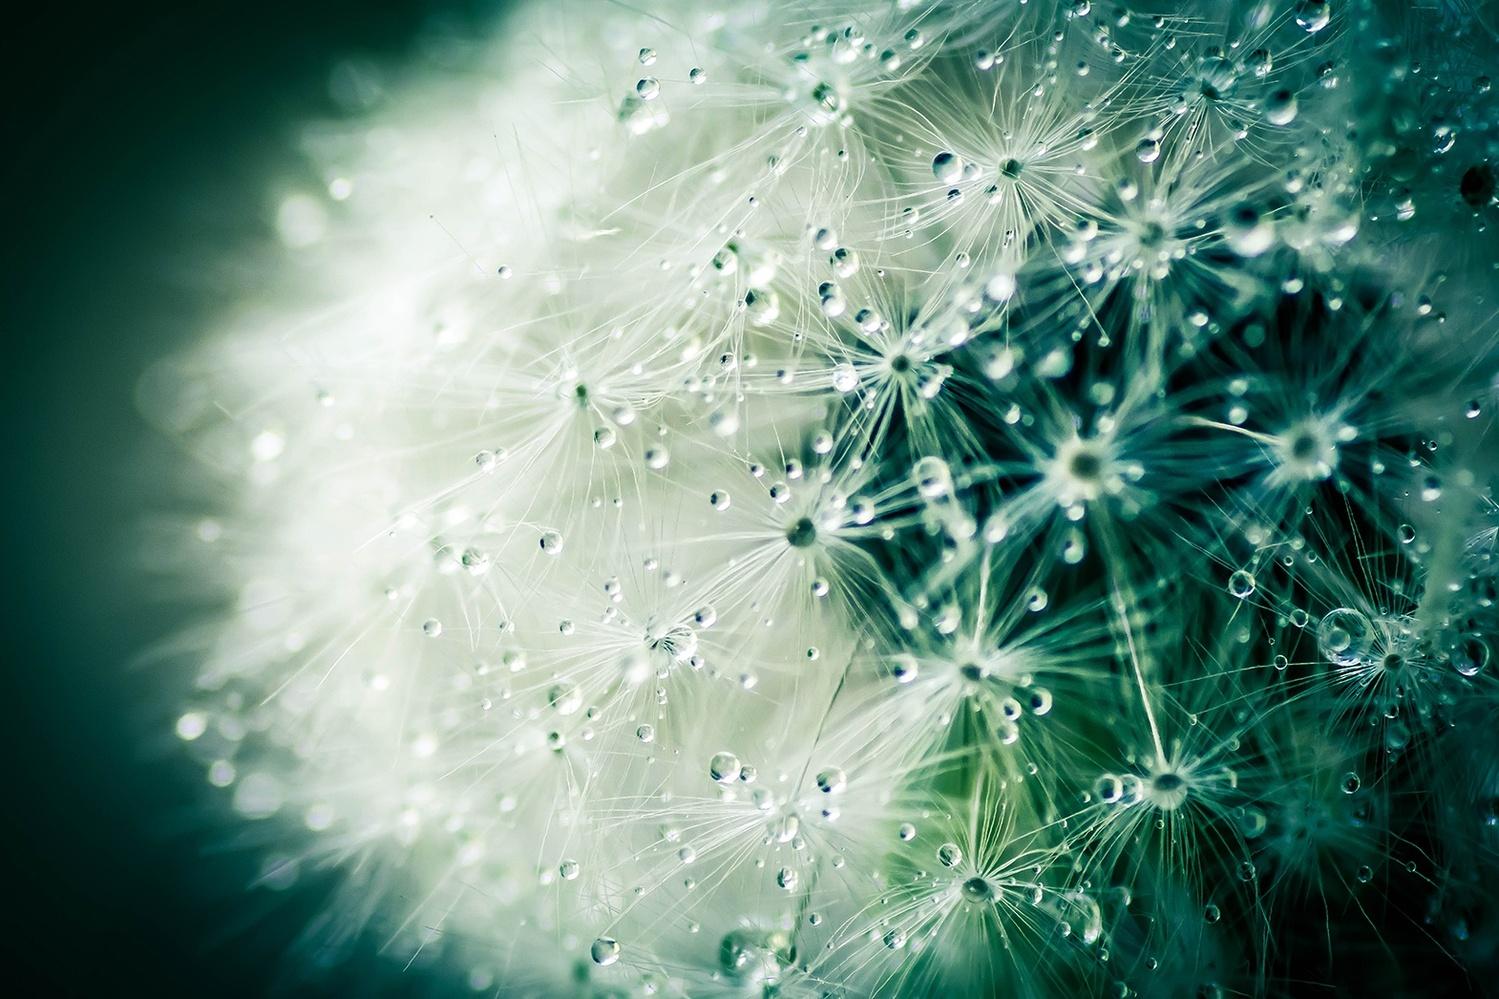 Dandelion Dew by Novak Miler